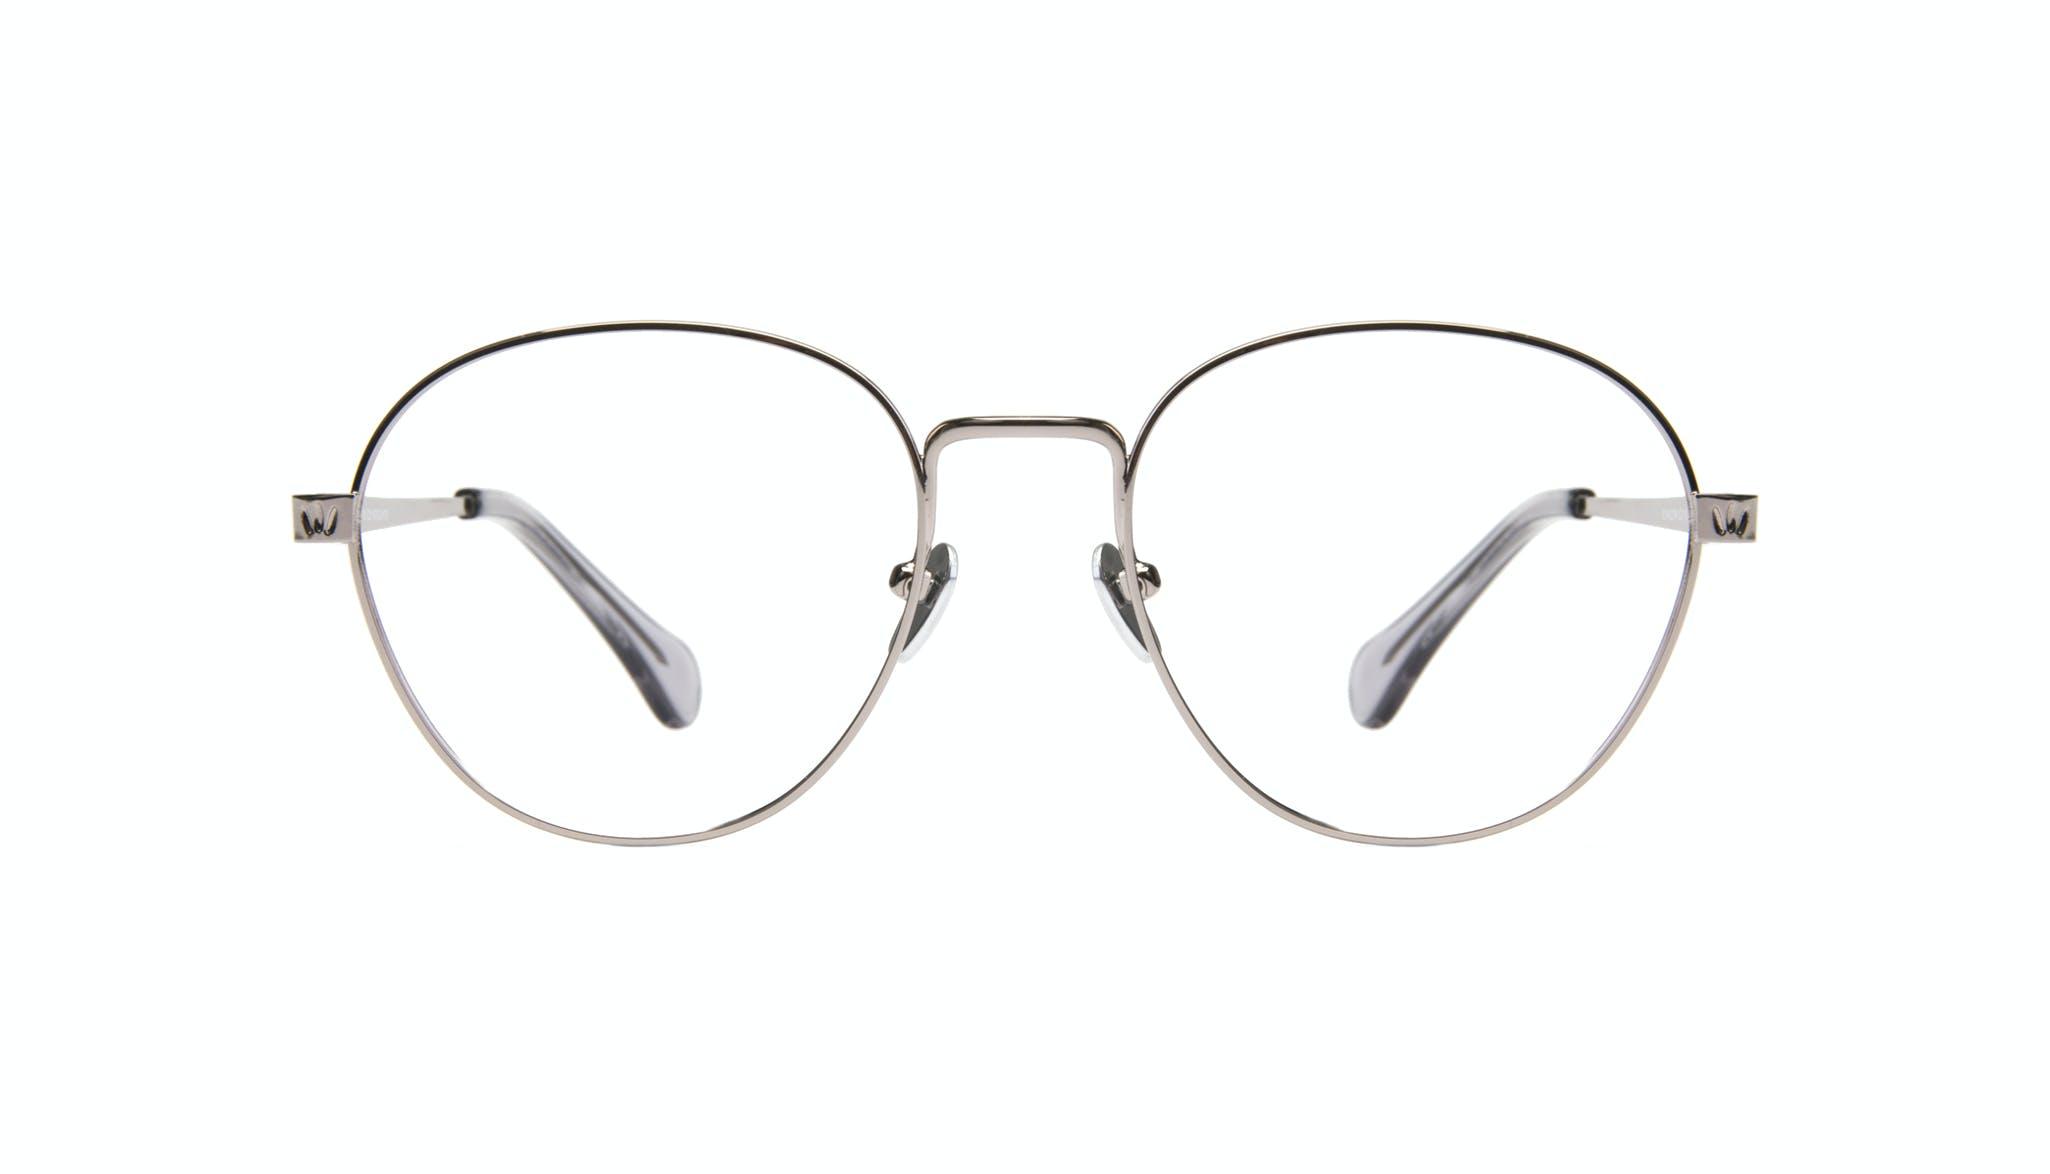 Affordable Fashion Glasses Round Eyeglasses Women Brace Silver Front